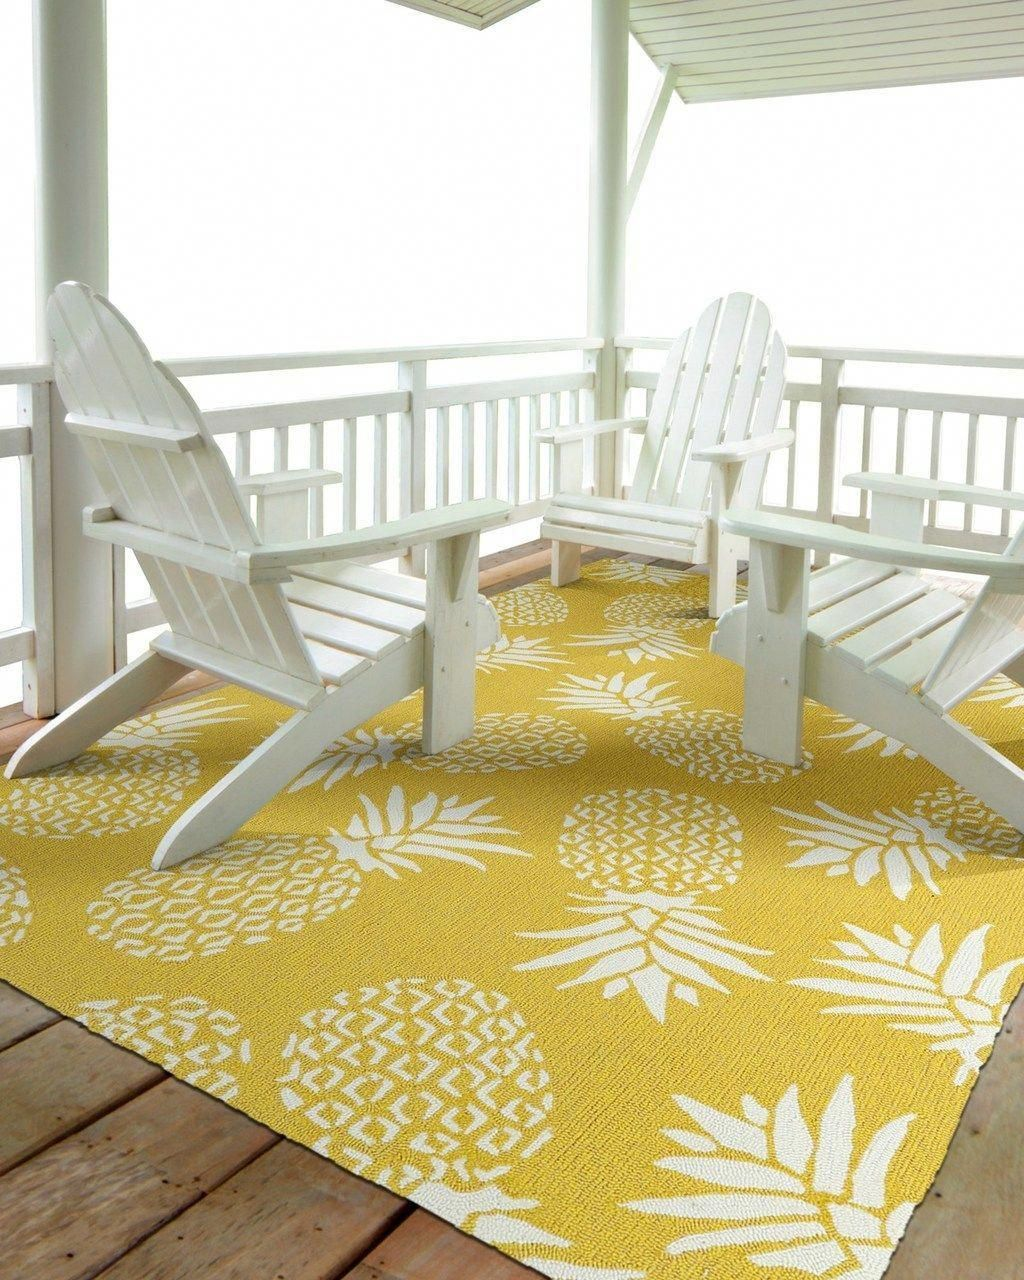 Tropical Beach House Interior: Beach House Interior Designs Pictures #BEACHHOUSEINTERIORS